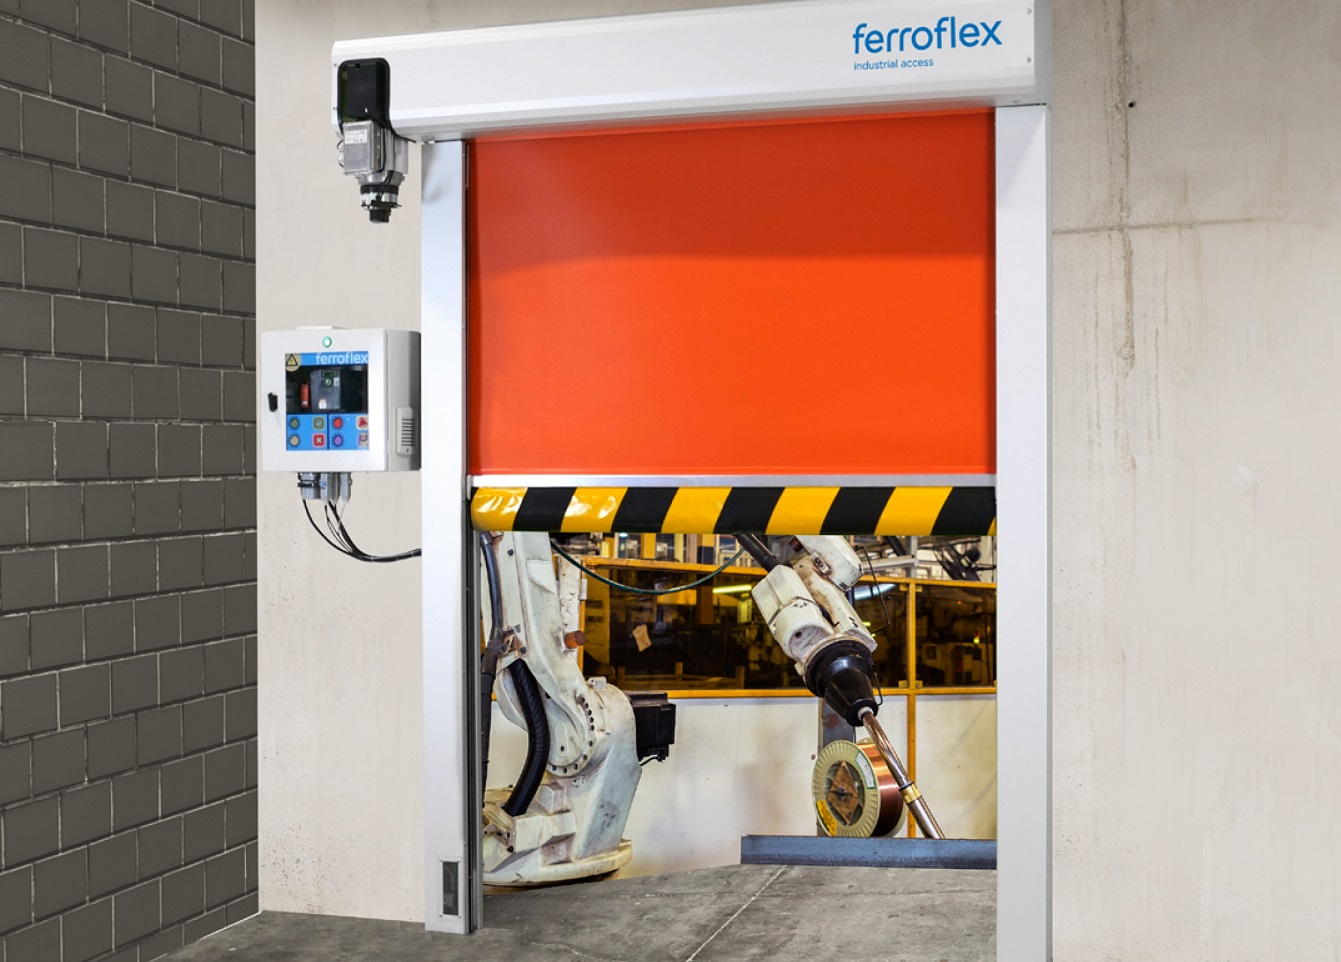 puerta automatica lineas de produccion manusa ferroflex production line automatic door